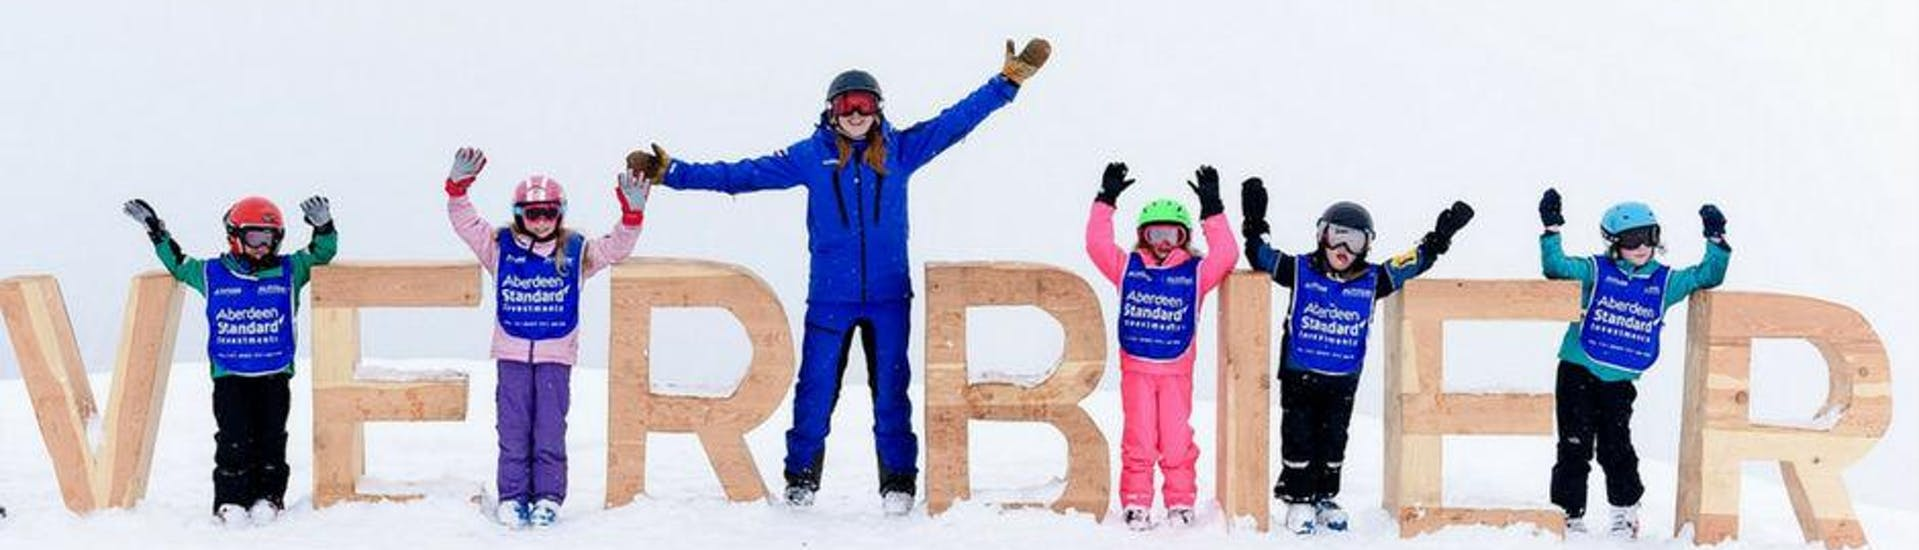 Kids Ski Lessons (6-15 y.) for All Levels met Altitude Ski School Verbier & Gstaad - Hero image